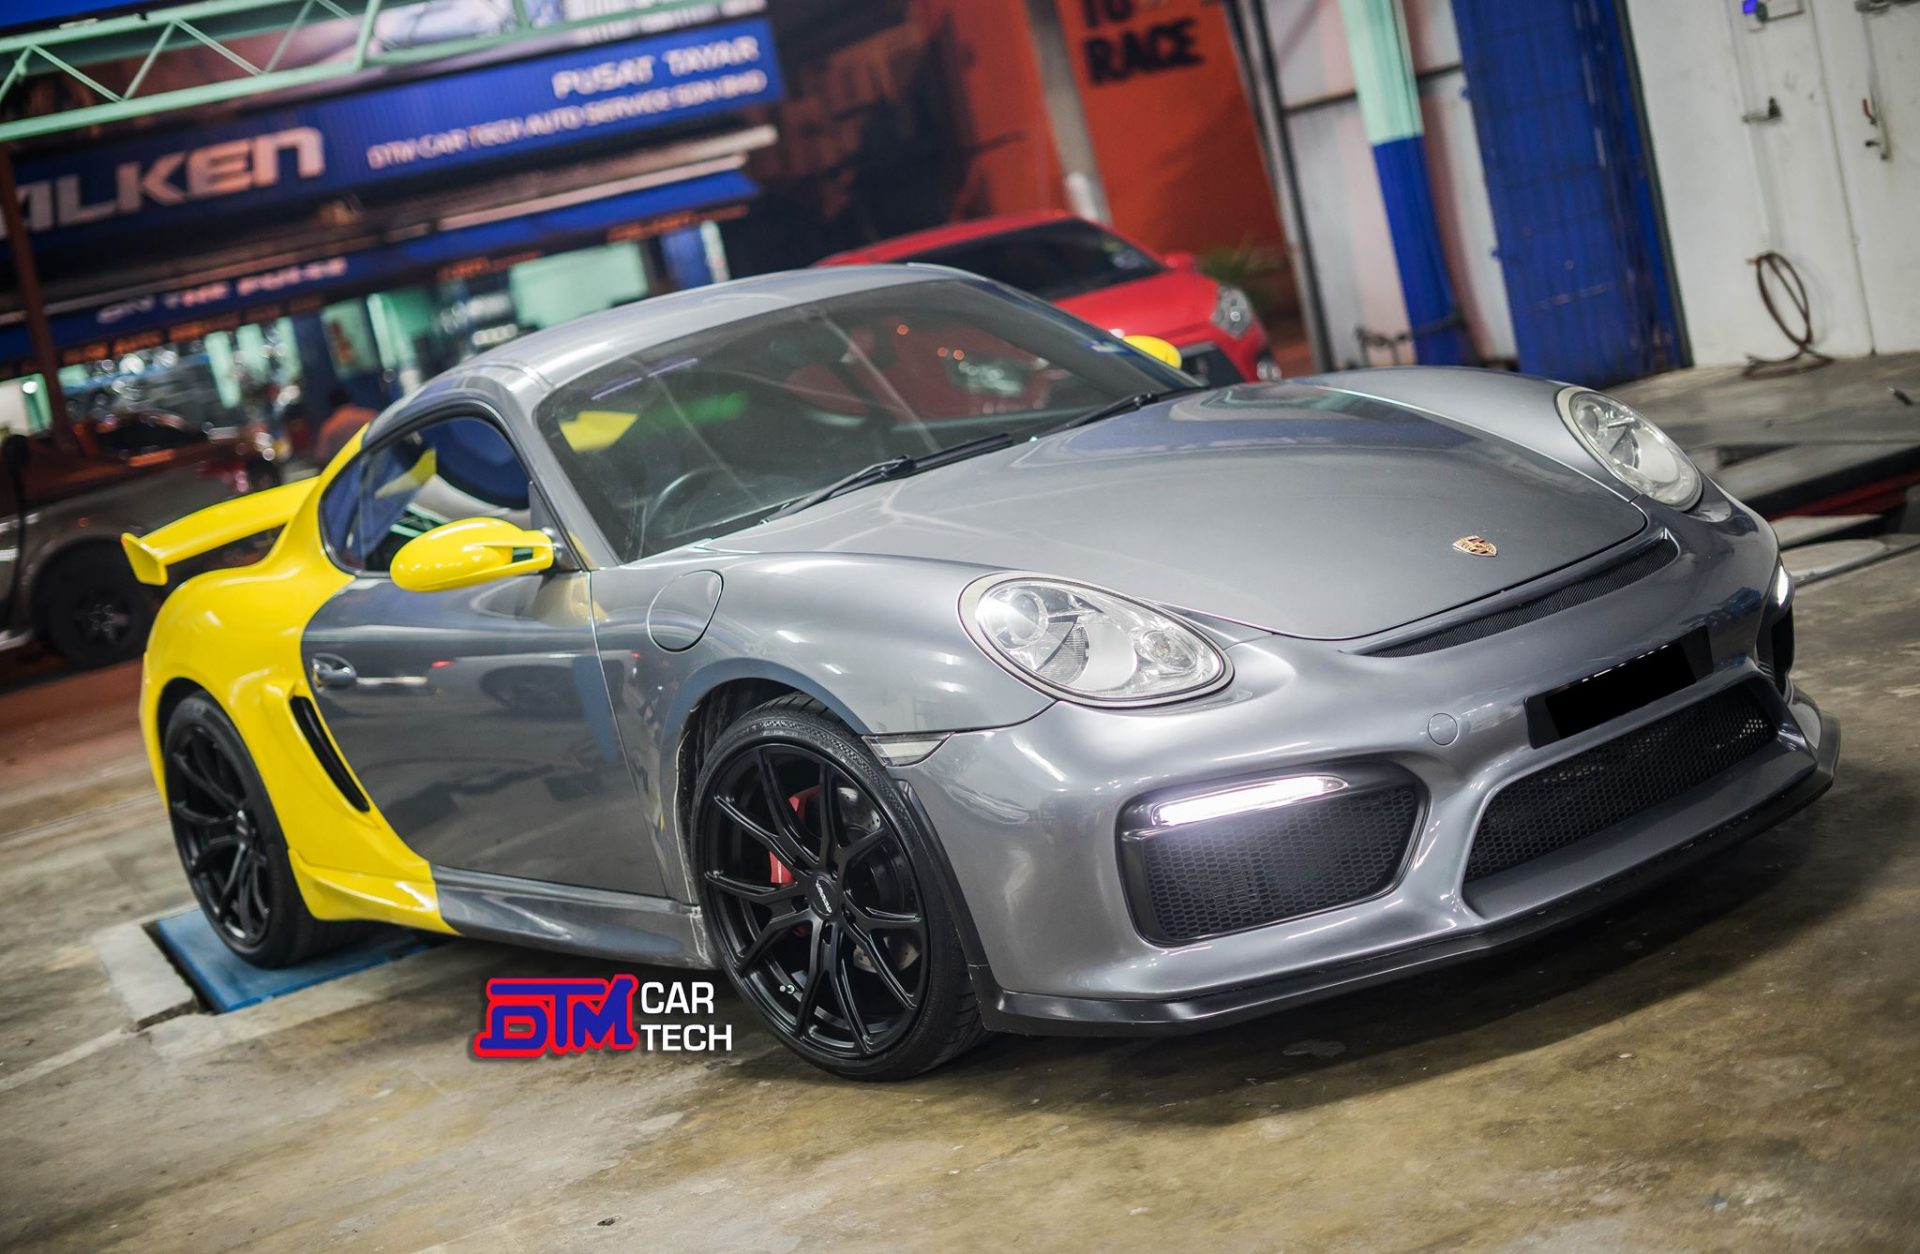 Porsche Cayman Rims Varro VD01 Black Wheels Staggered